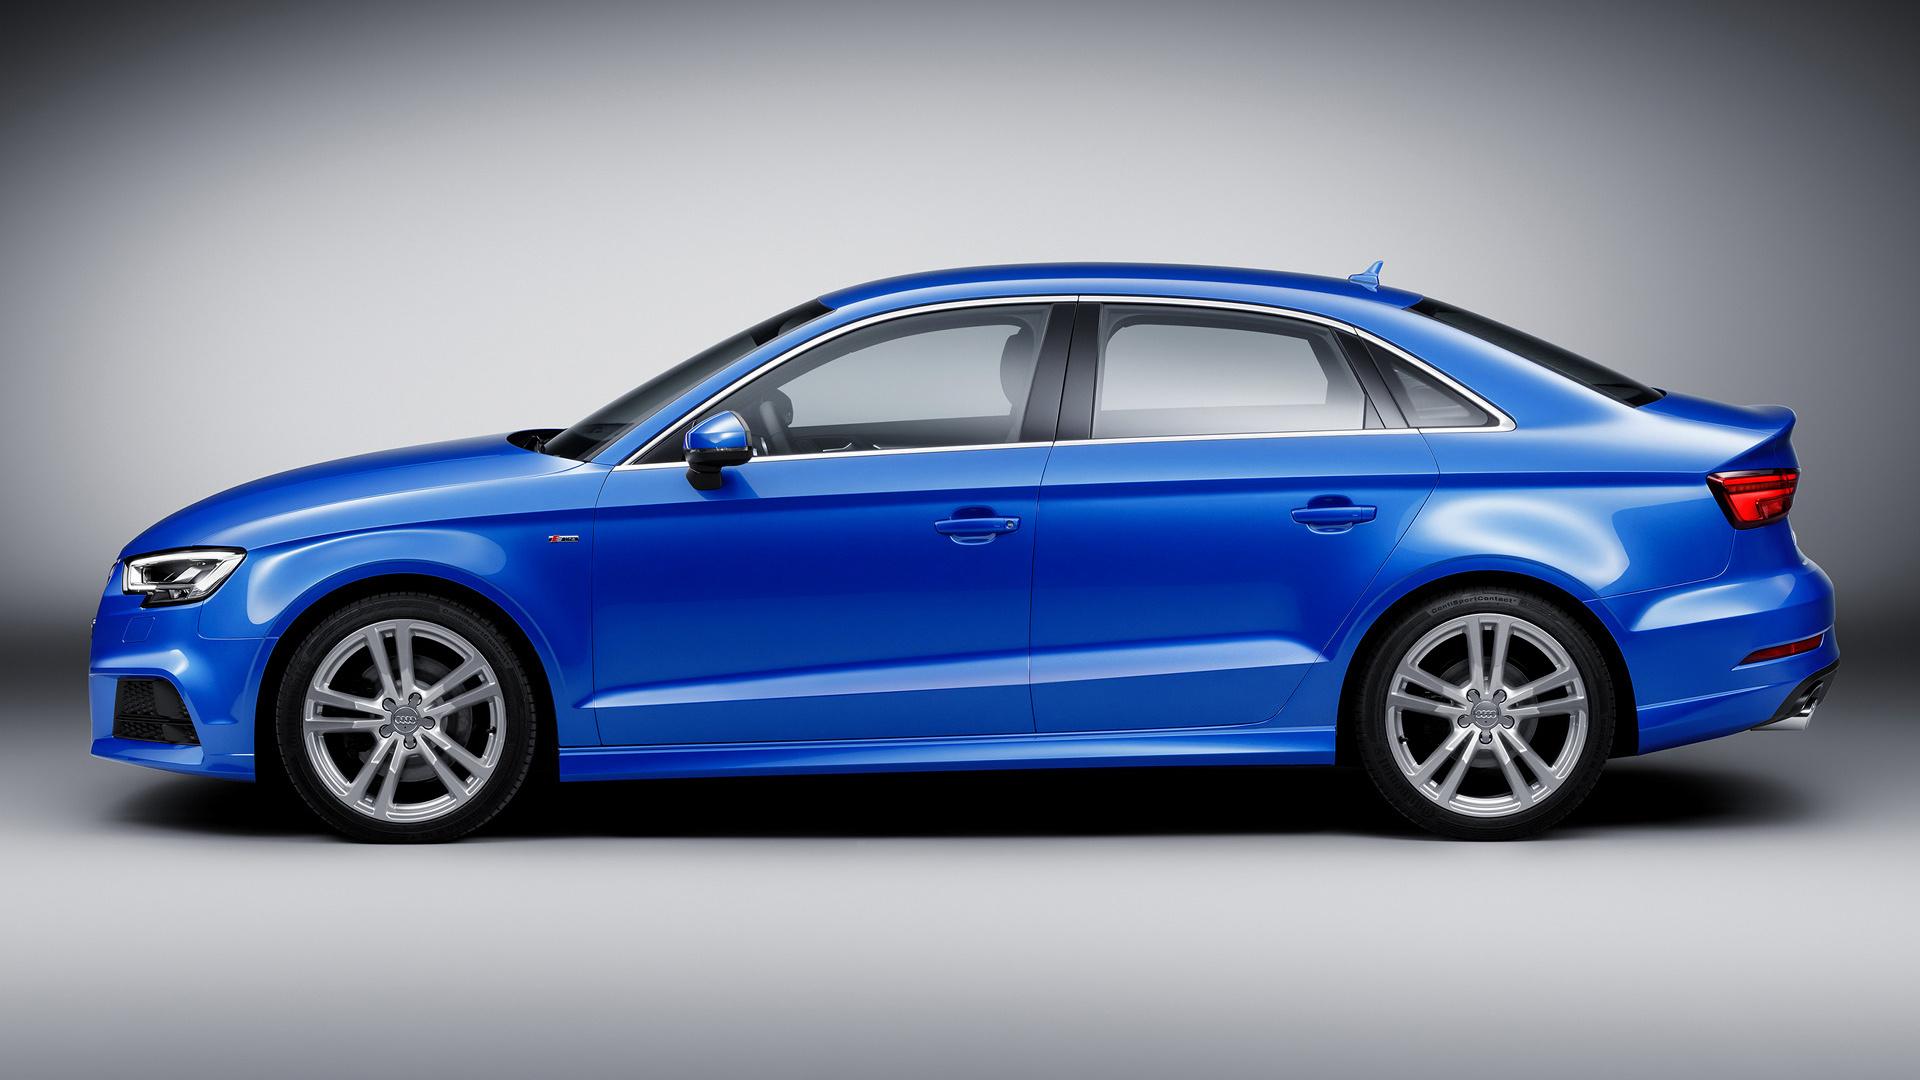 Audi A3 Sedan >> 2016 Audi A3 Sedan S line - Wallpapers and HD Images   Car ...